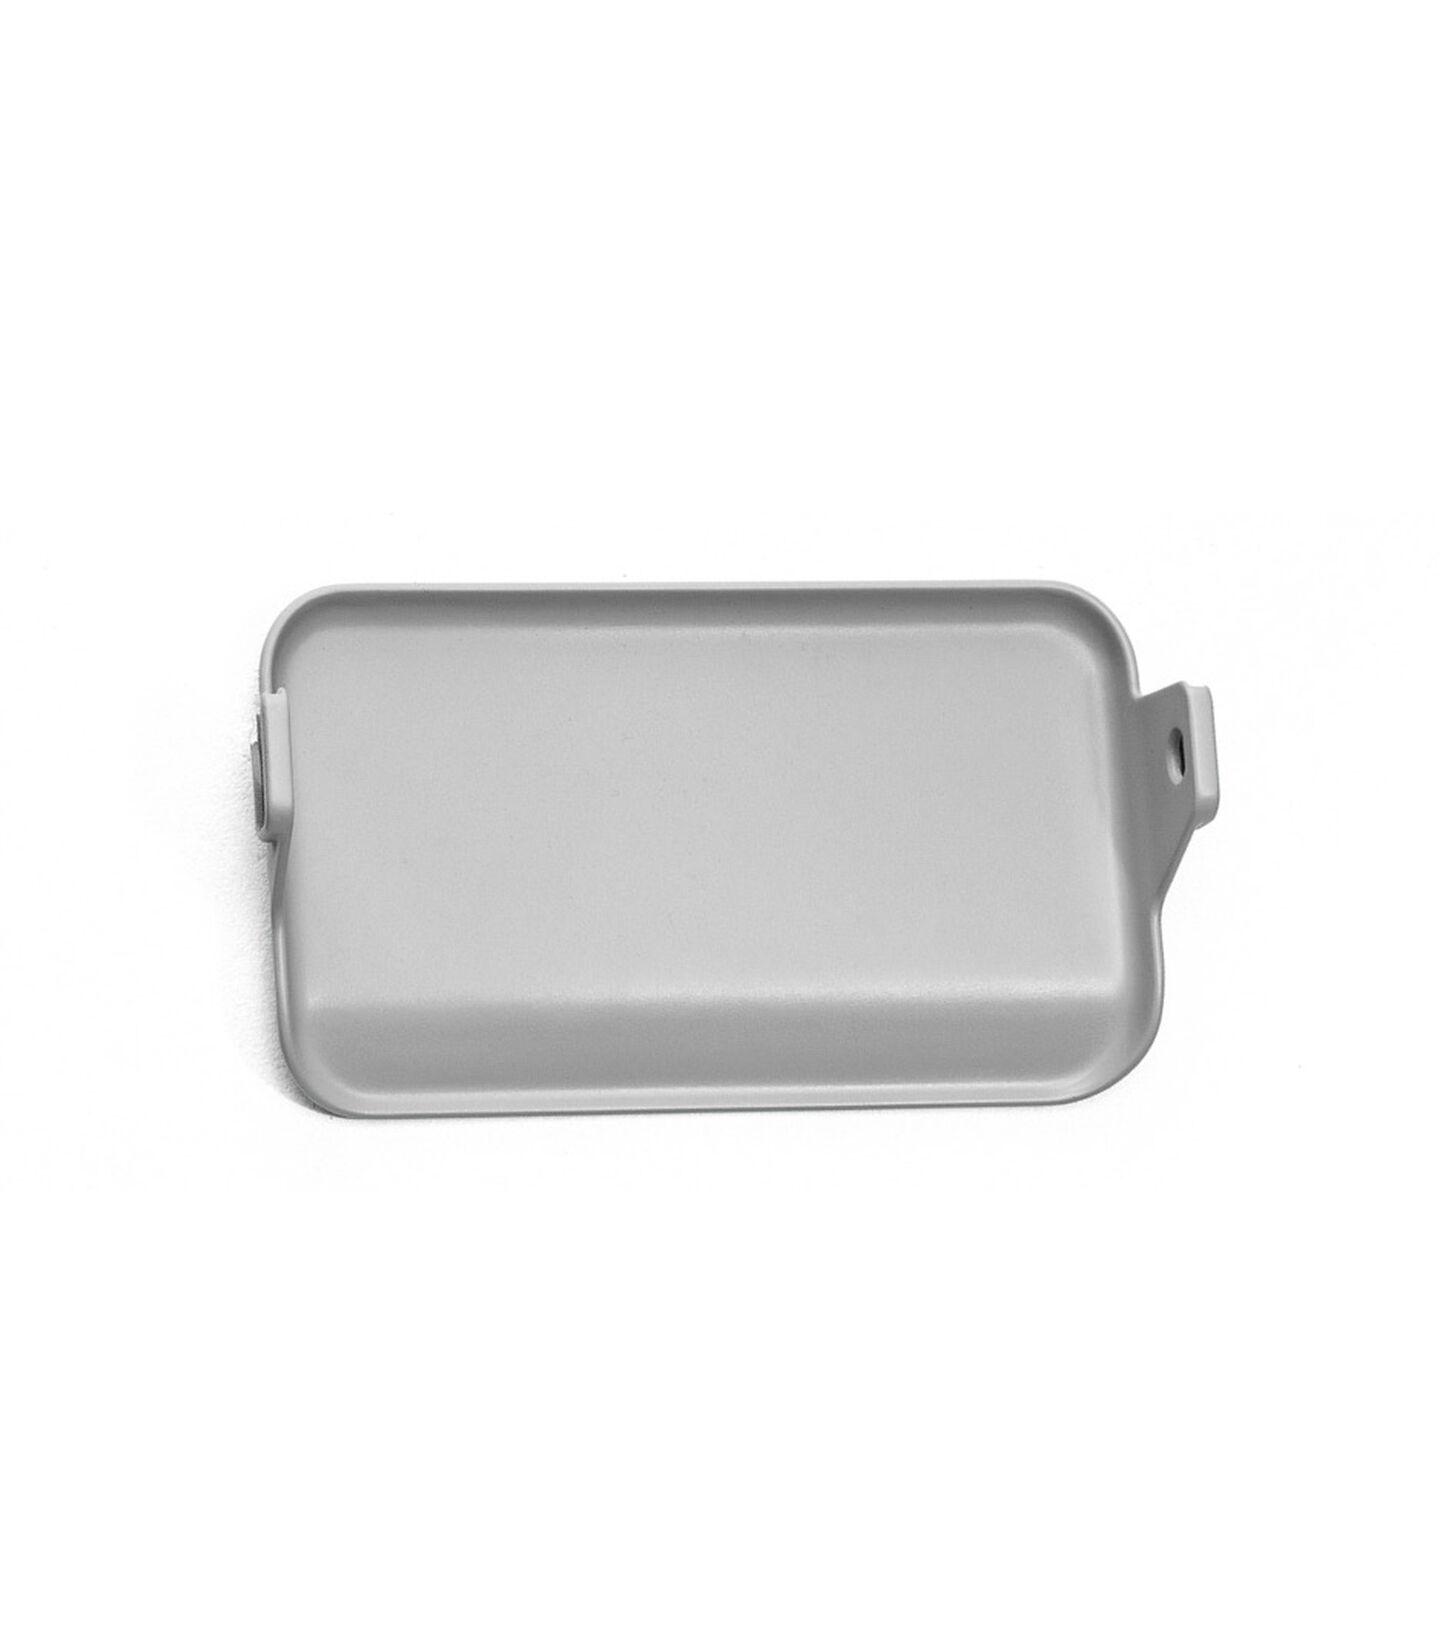 Stokke® Clikk™ Fußstütze - Cloud Grey, Cloud Grey, mainview view 2